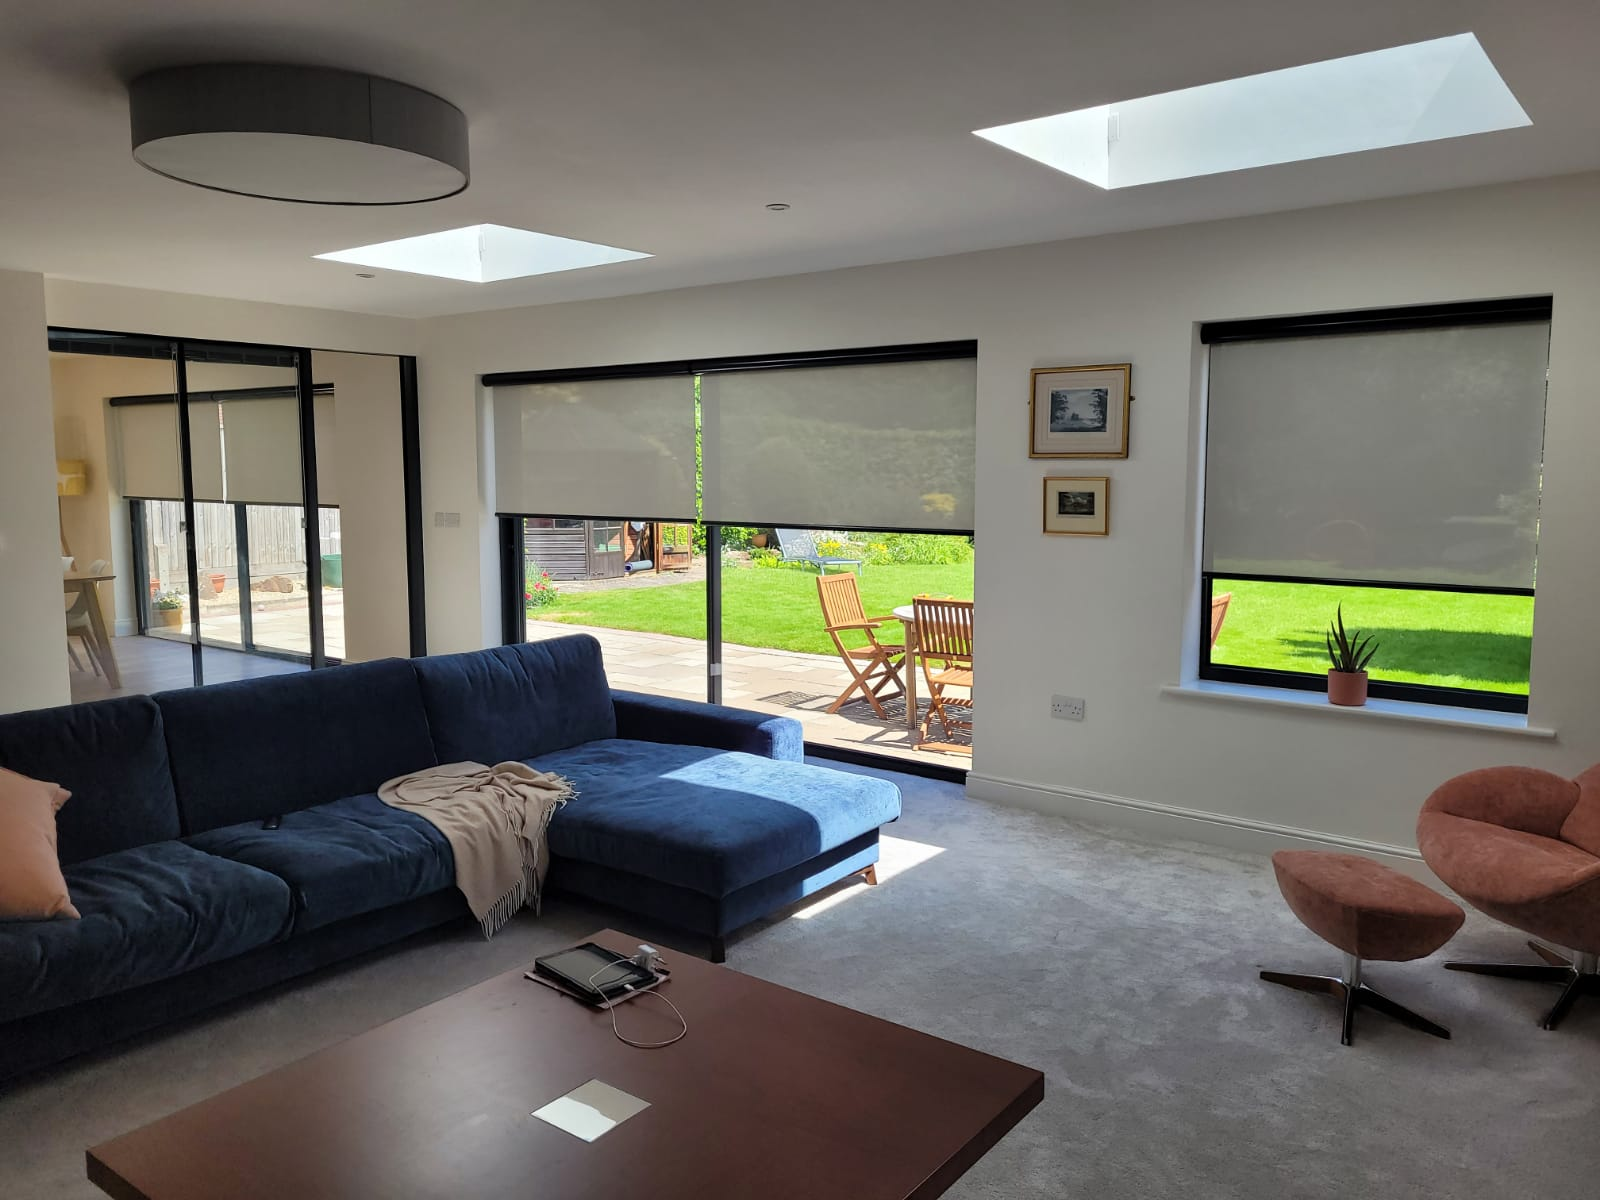 choosing house blinds